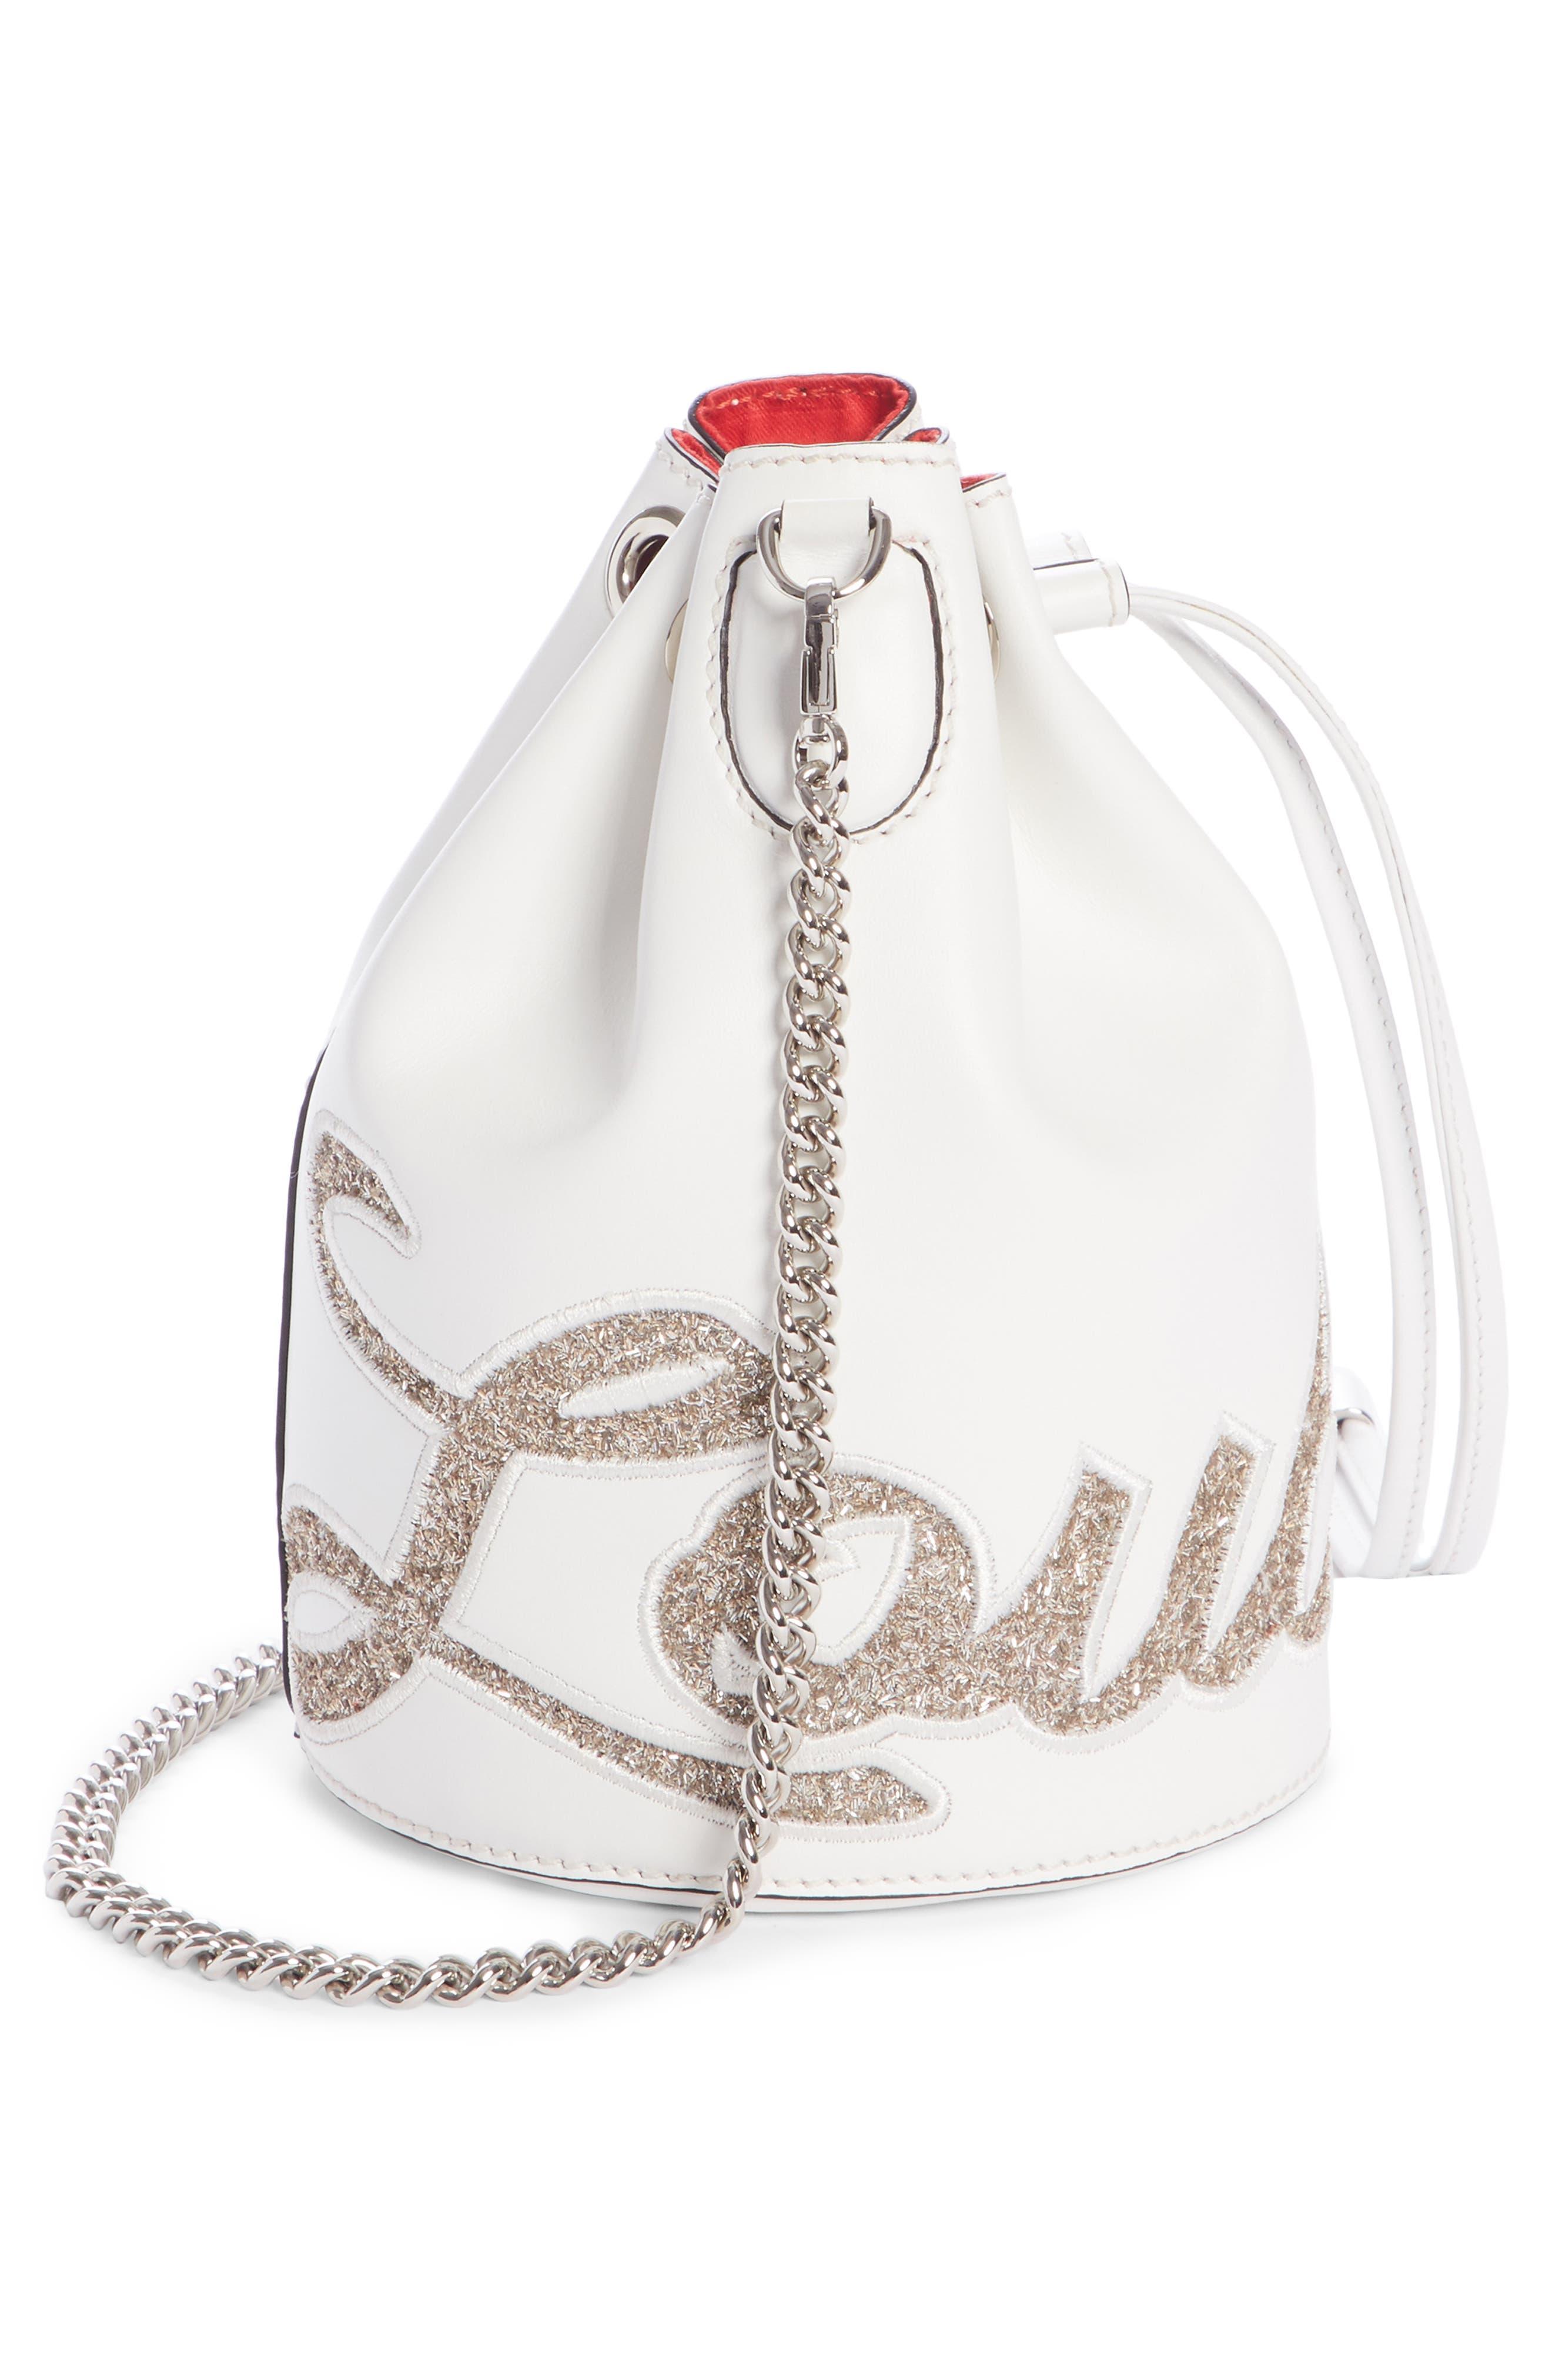 Marie Jane Calfskin Bucket Bag,                             Alternate thumbnail 4, color,                             SNOW/ PERLE